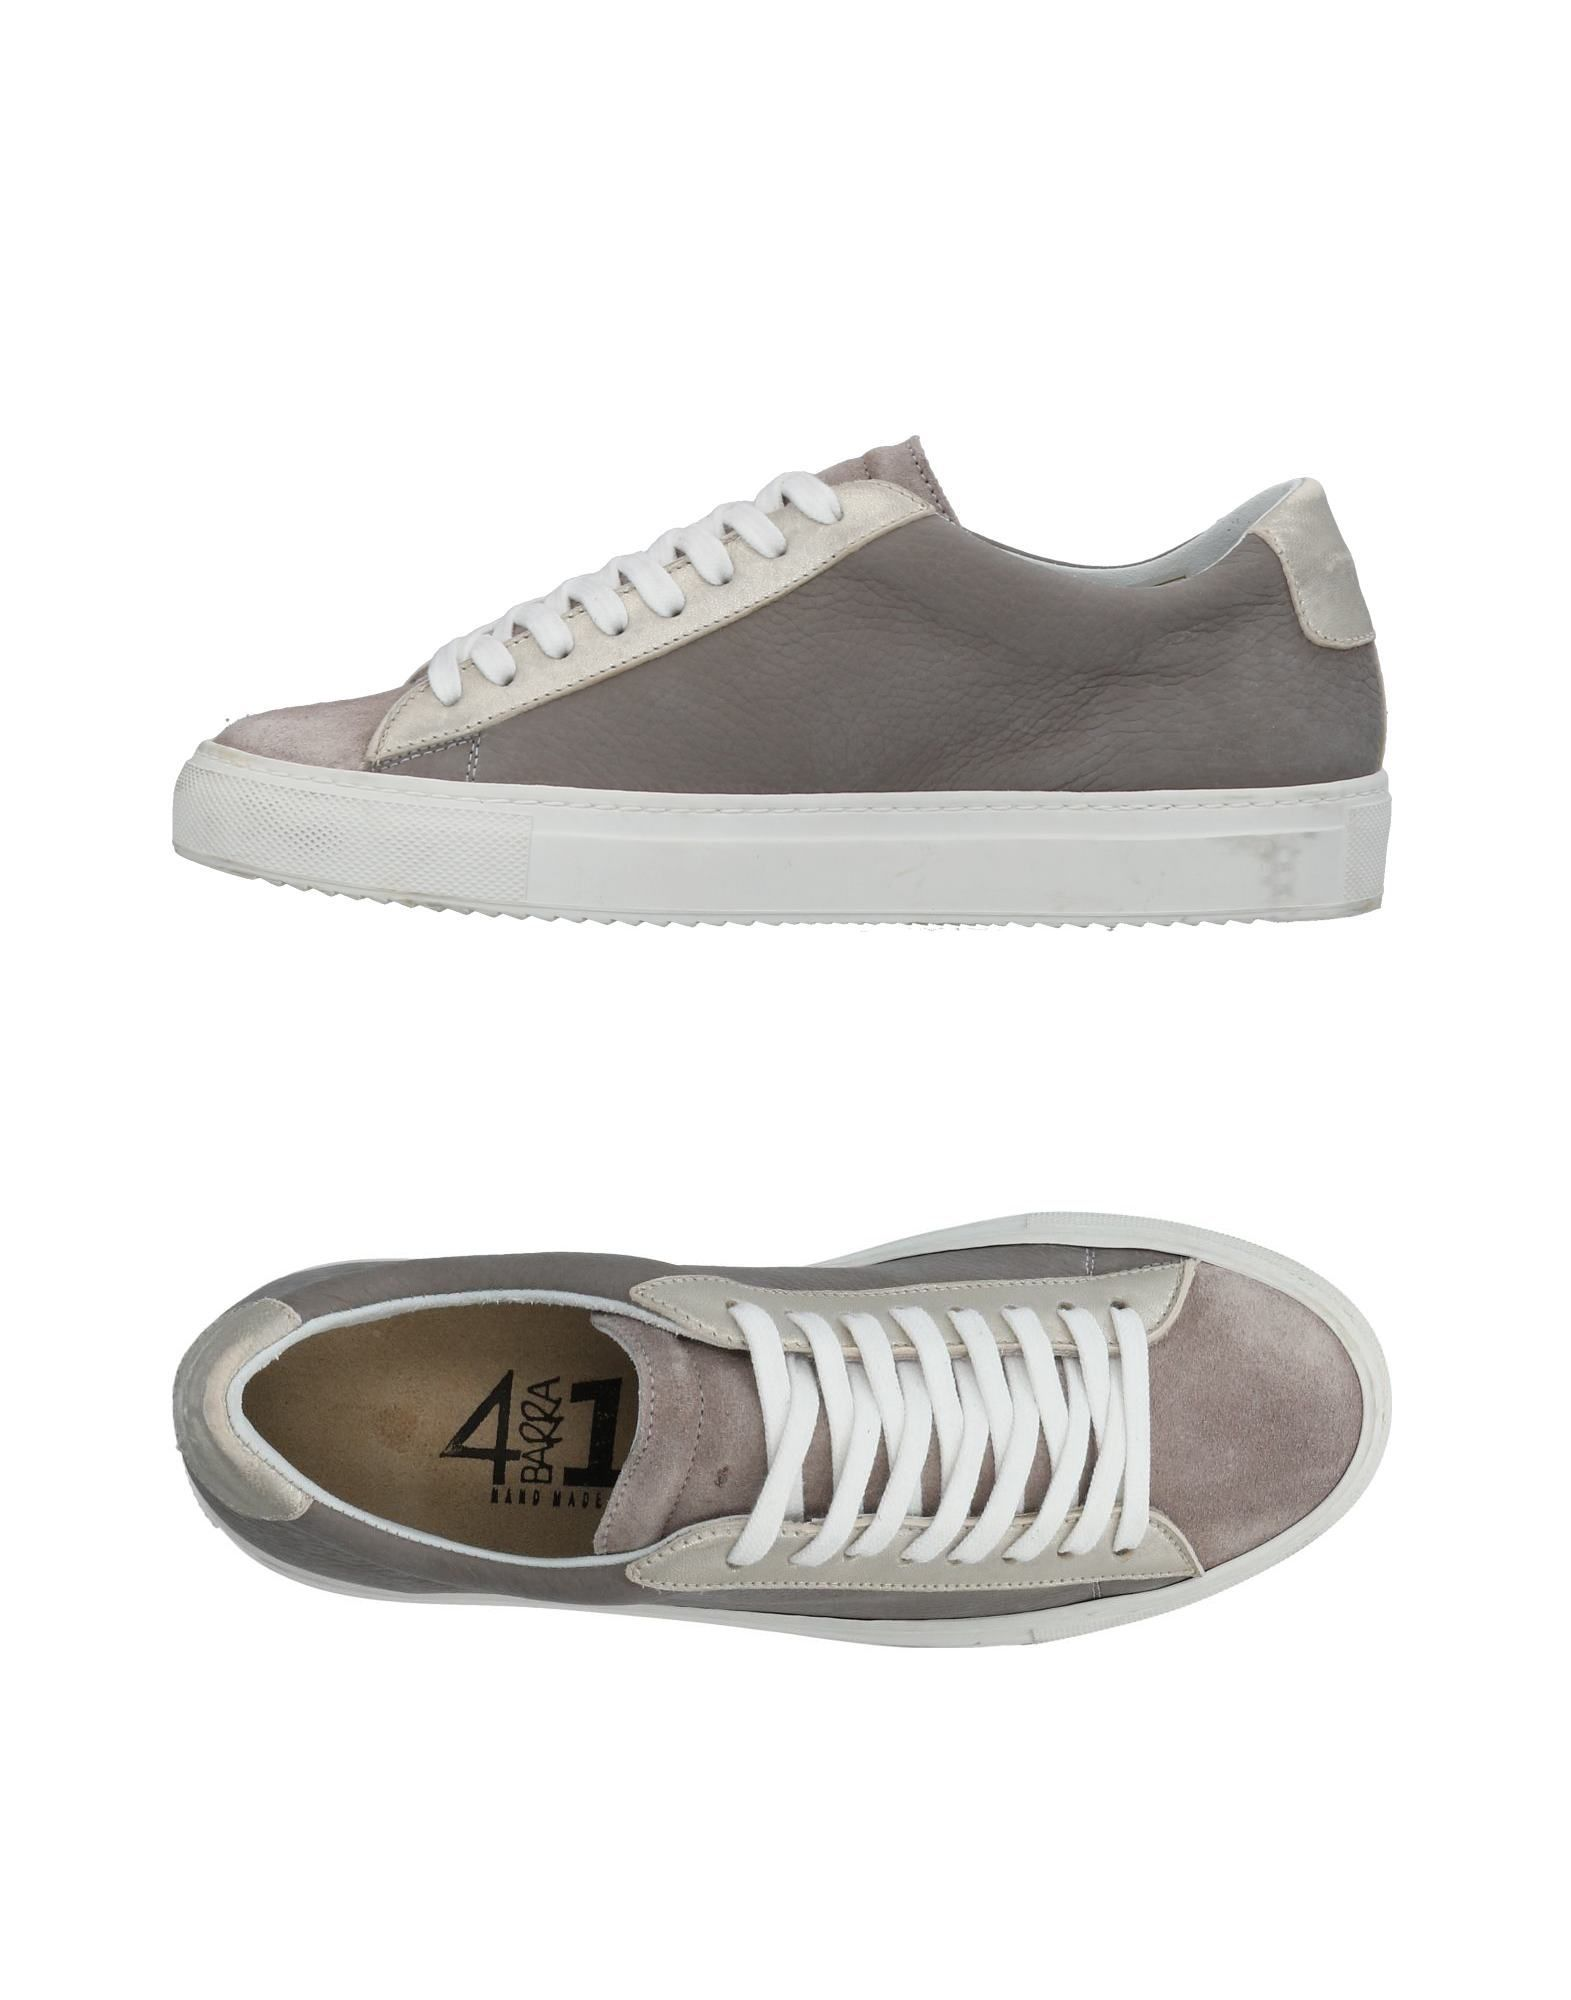 Quattrobarradodici Sneakers Damen  11434284DE Gute Qualität beliebte Schuhe